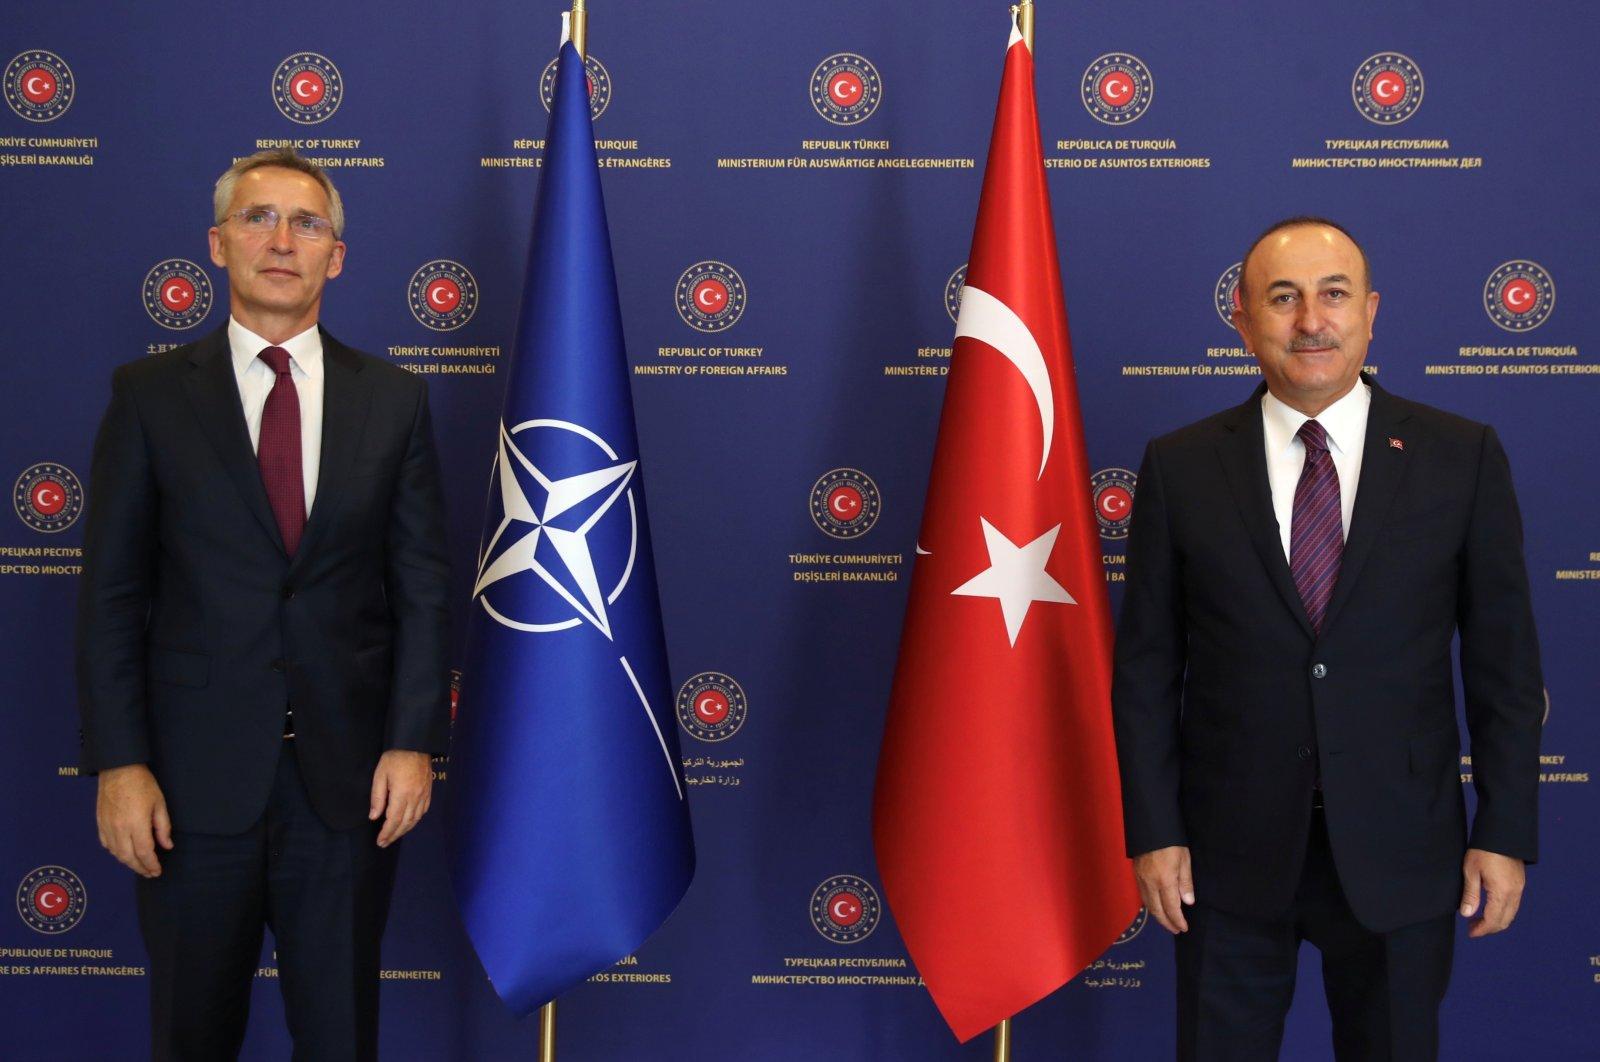 Turkish Foreign Minister Mevlüt Çavuşoğlu meets with NATO Secretary-General Jens Stoltenberg in capital Ankara, Turkey, Oct. 5, 2020. (Reuters Photo)